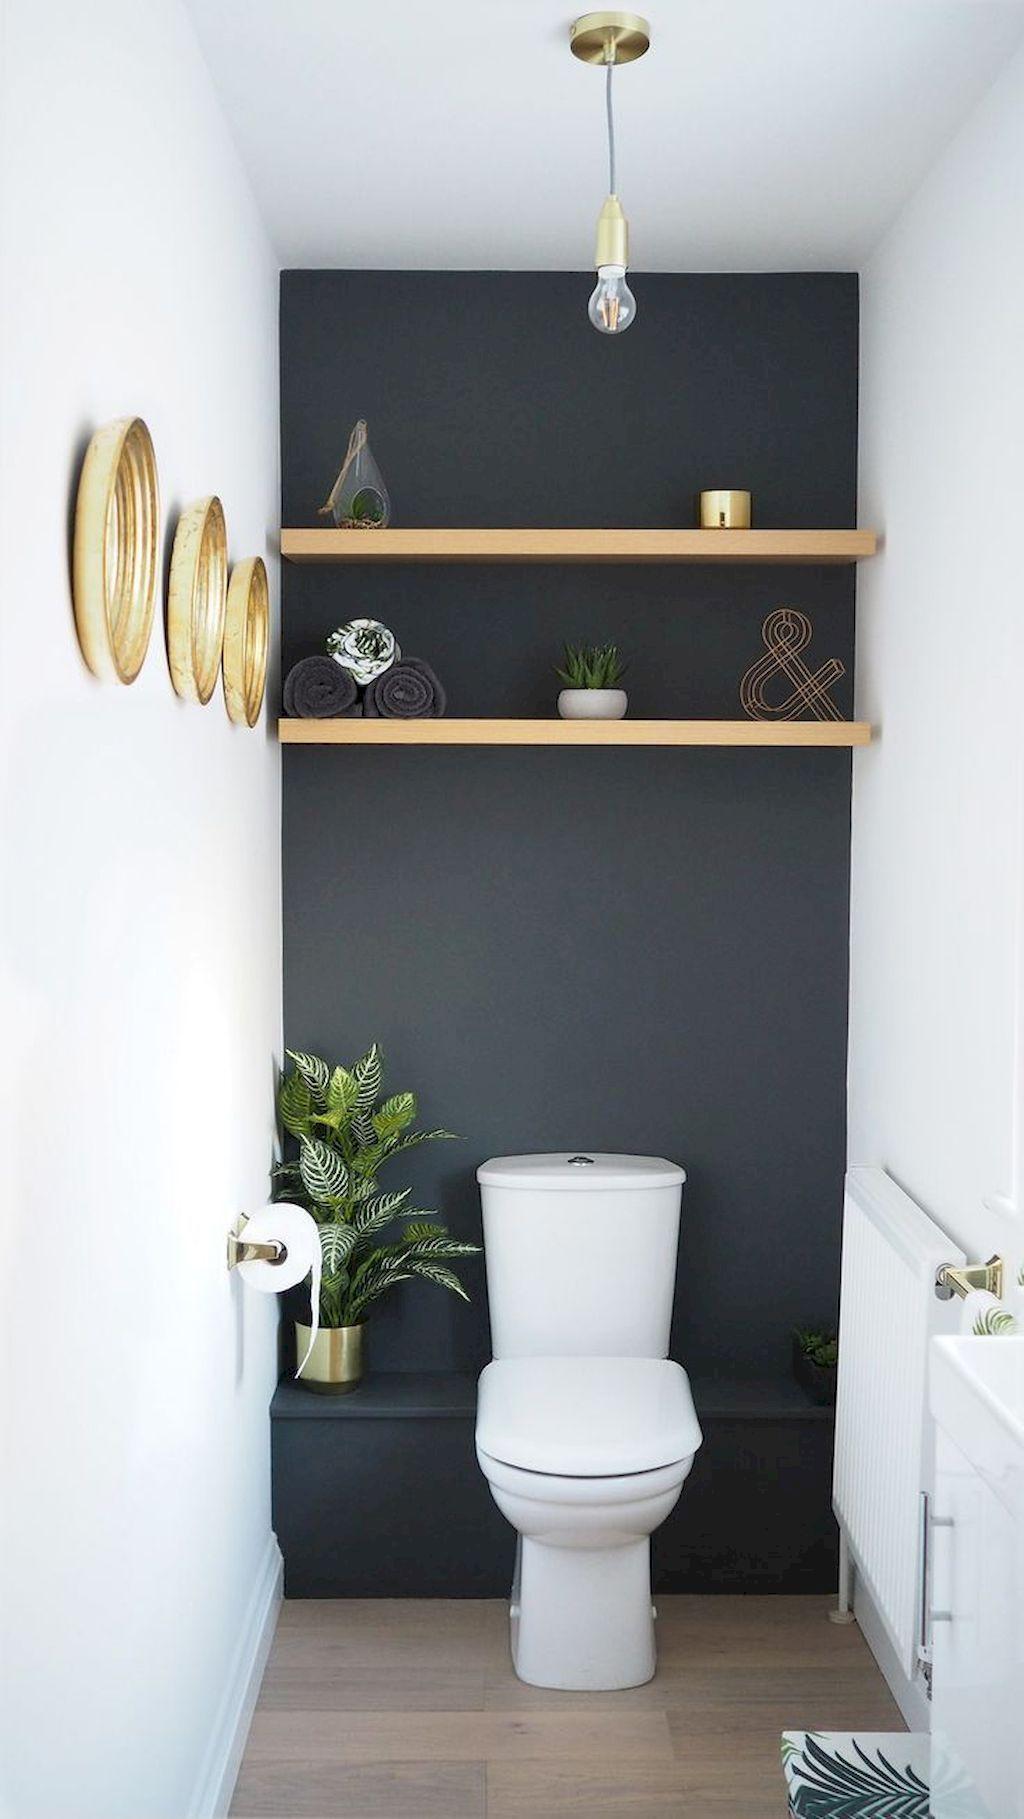 Toilet Closet (13) #BathroomToilets